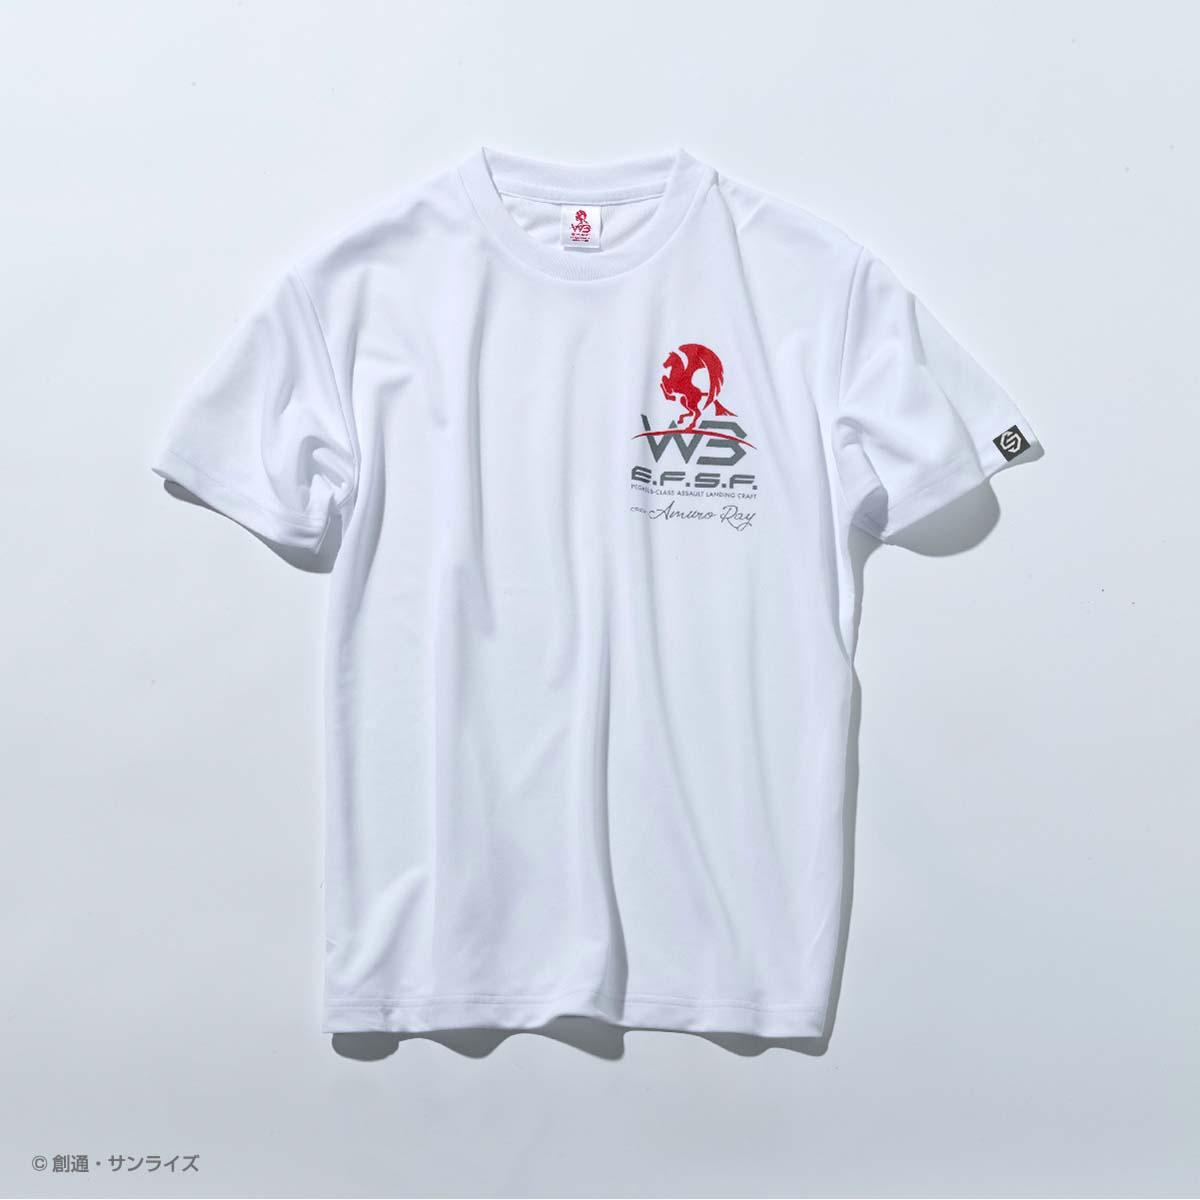 STRICT-G 『機動戦士ガンダム』 WHITE BASE トレーニングTシャツ アムロ・レイ